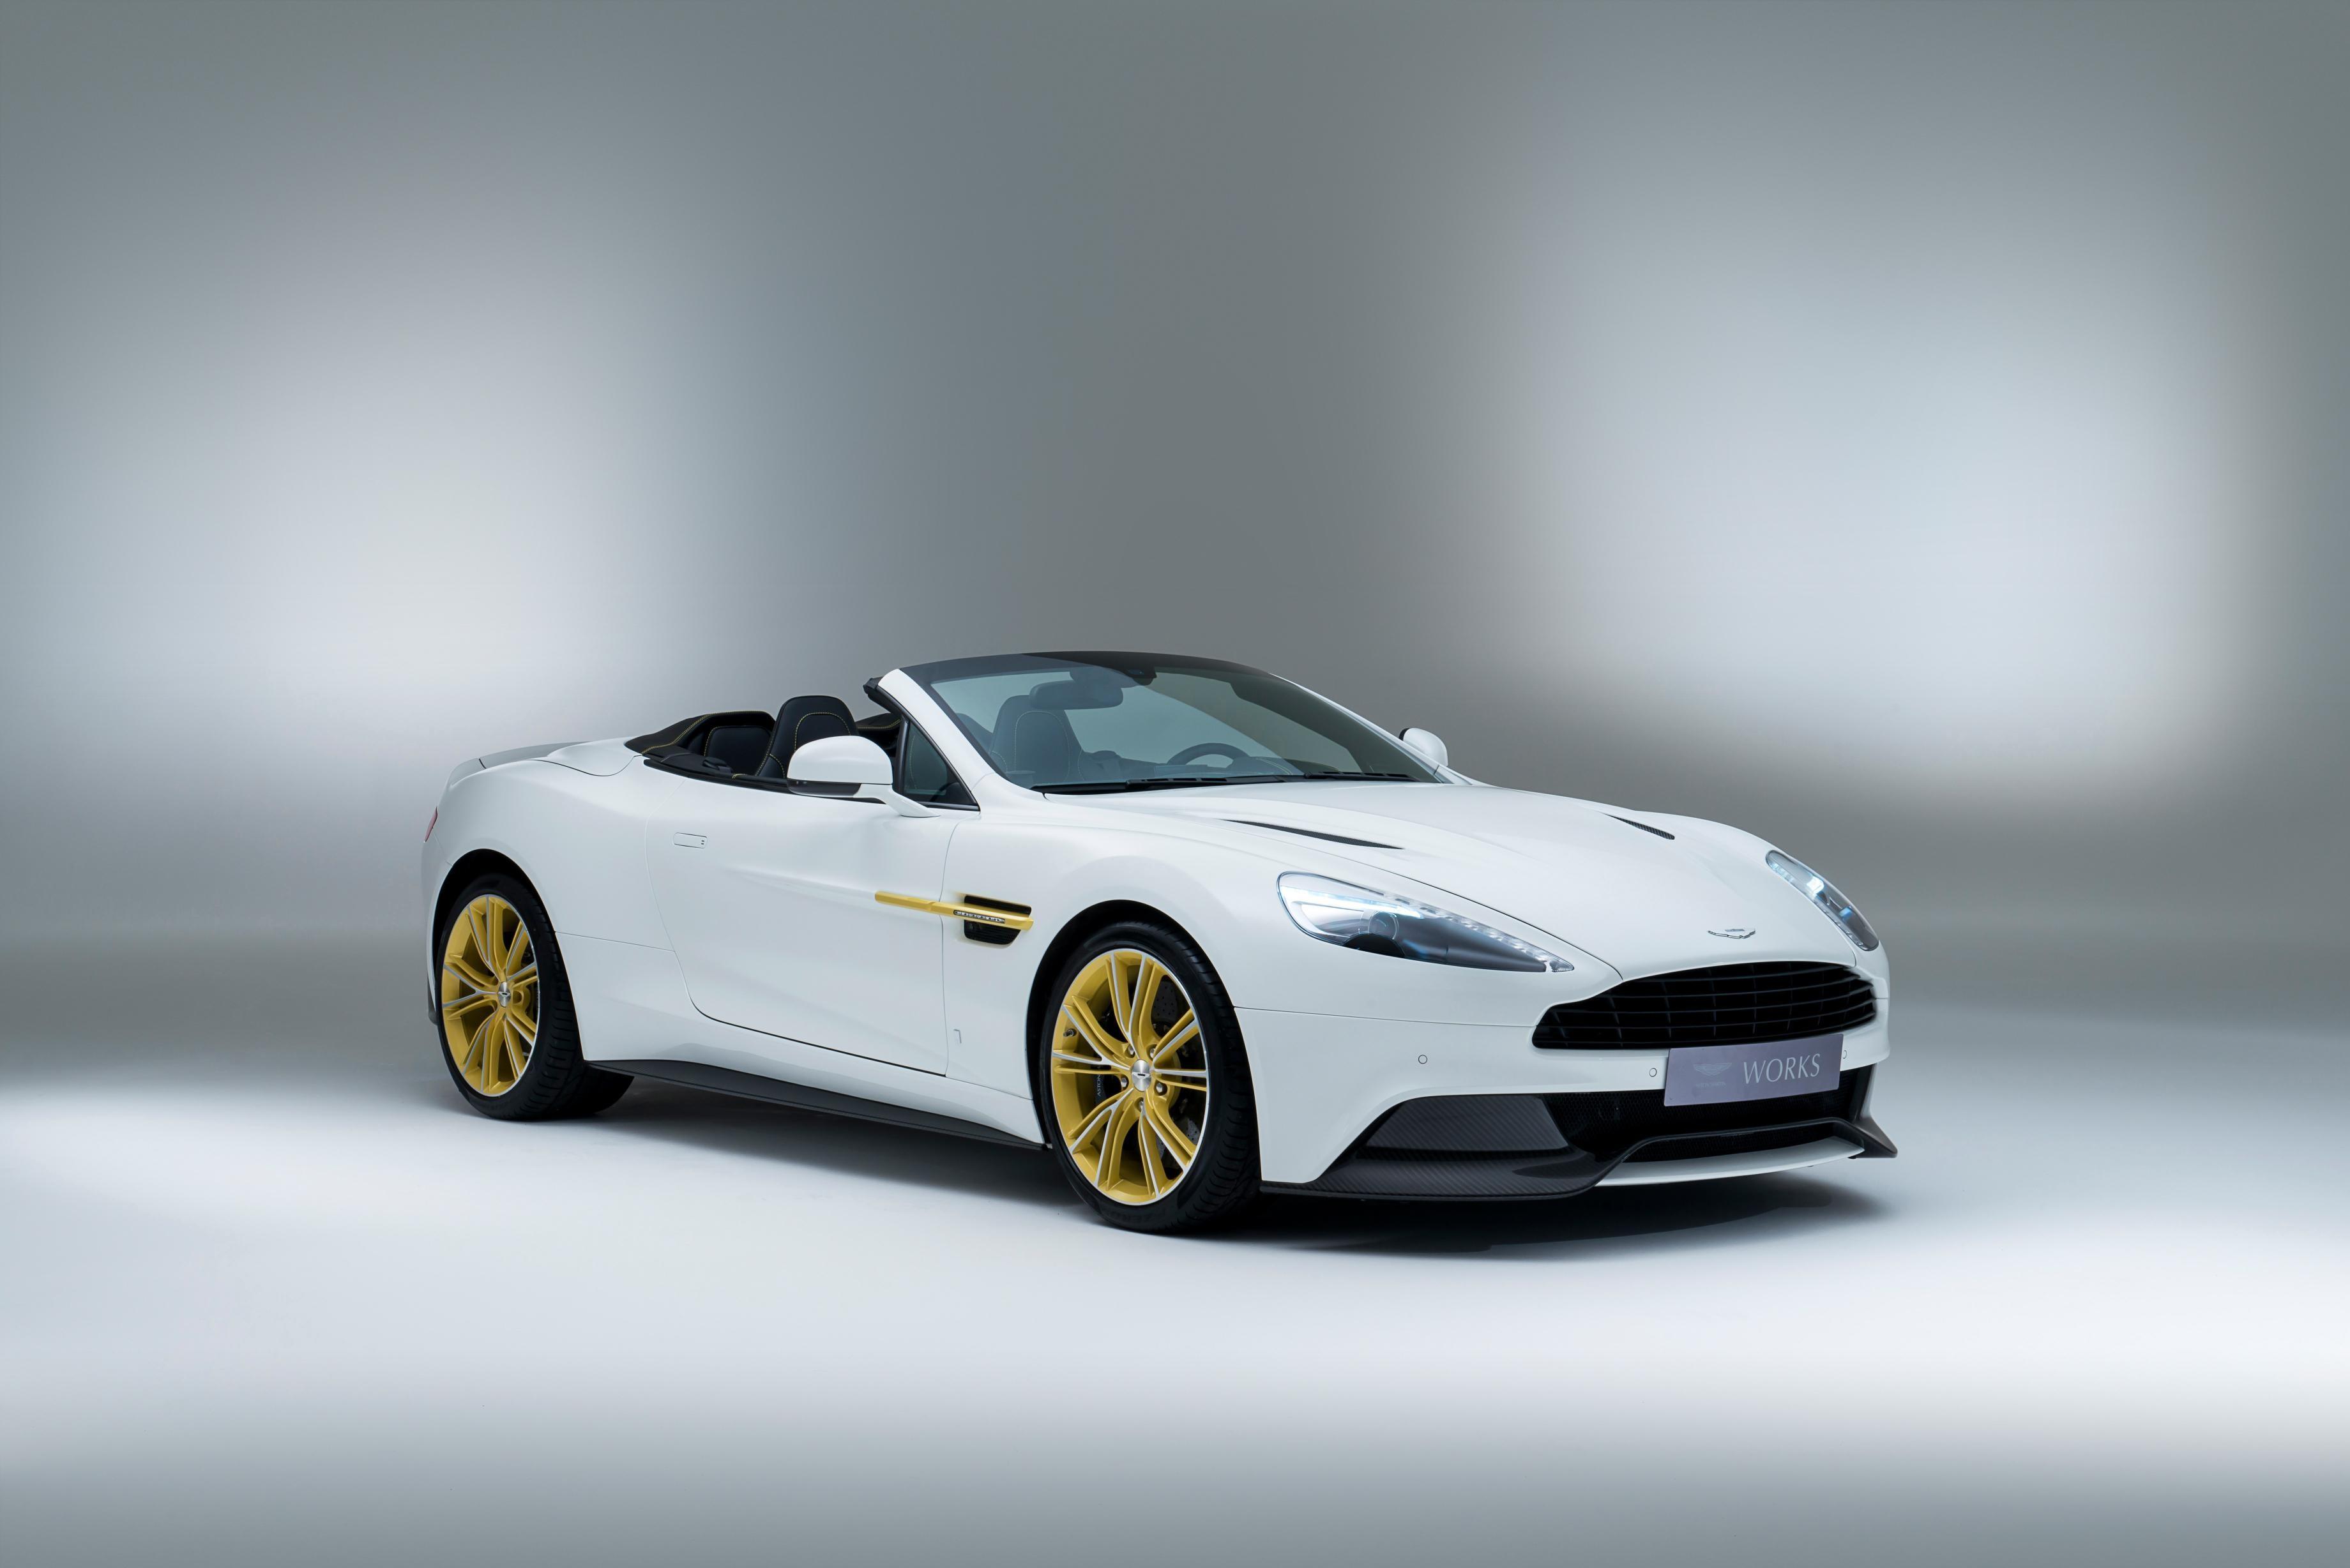 Safest Motorcycle Helmet >> James Bond Wouldn't Drive the Aston Martin Works 60th Anniversary Vanquish - autoevolution